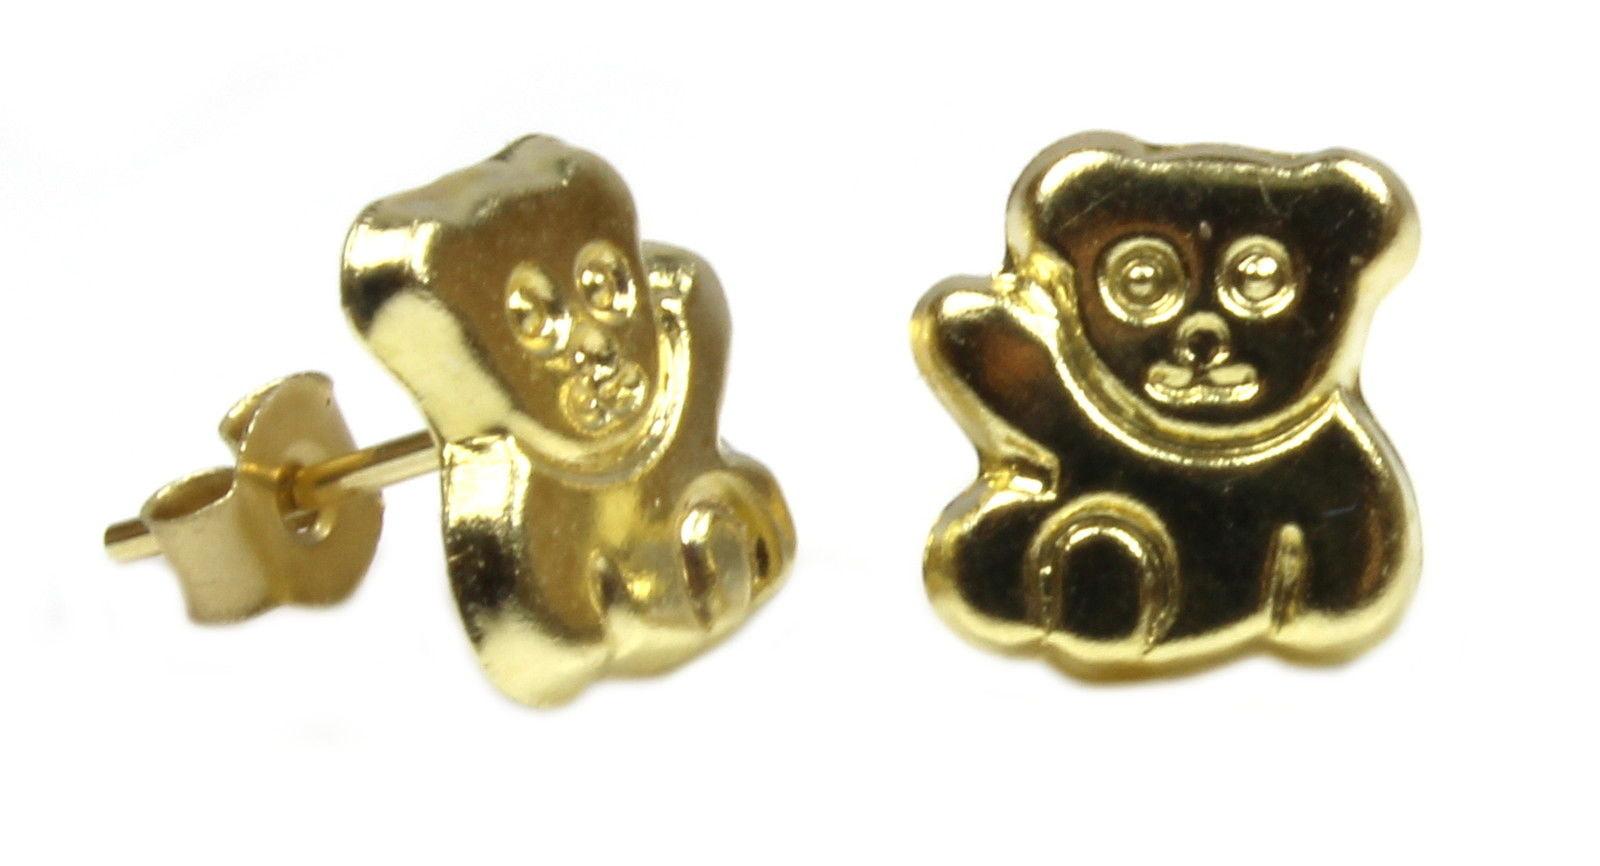 Arranview Jewellery Puppy Dog Stud Earring - 9ct Gold 4NCZYJ5bo